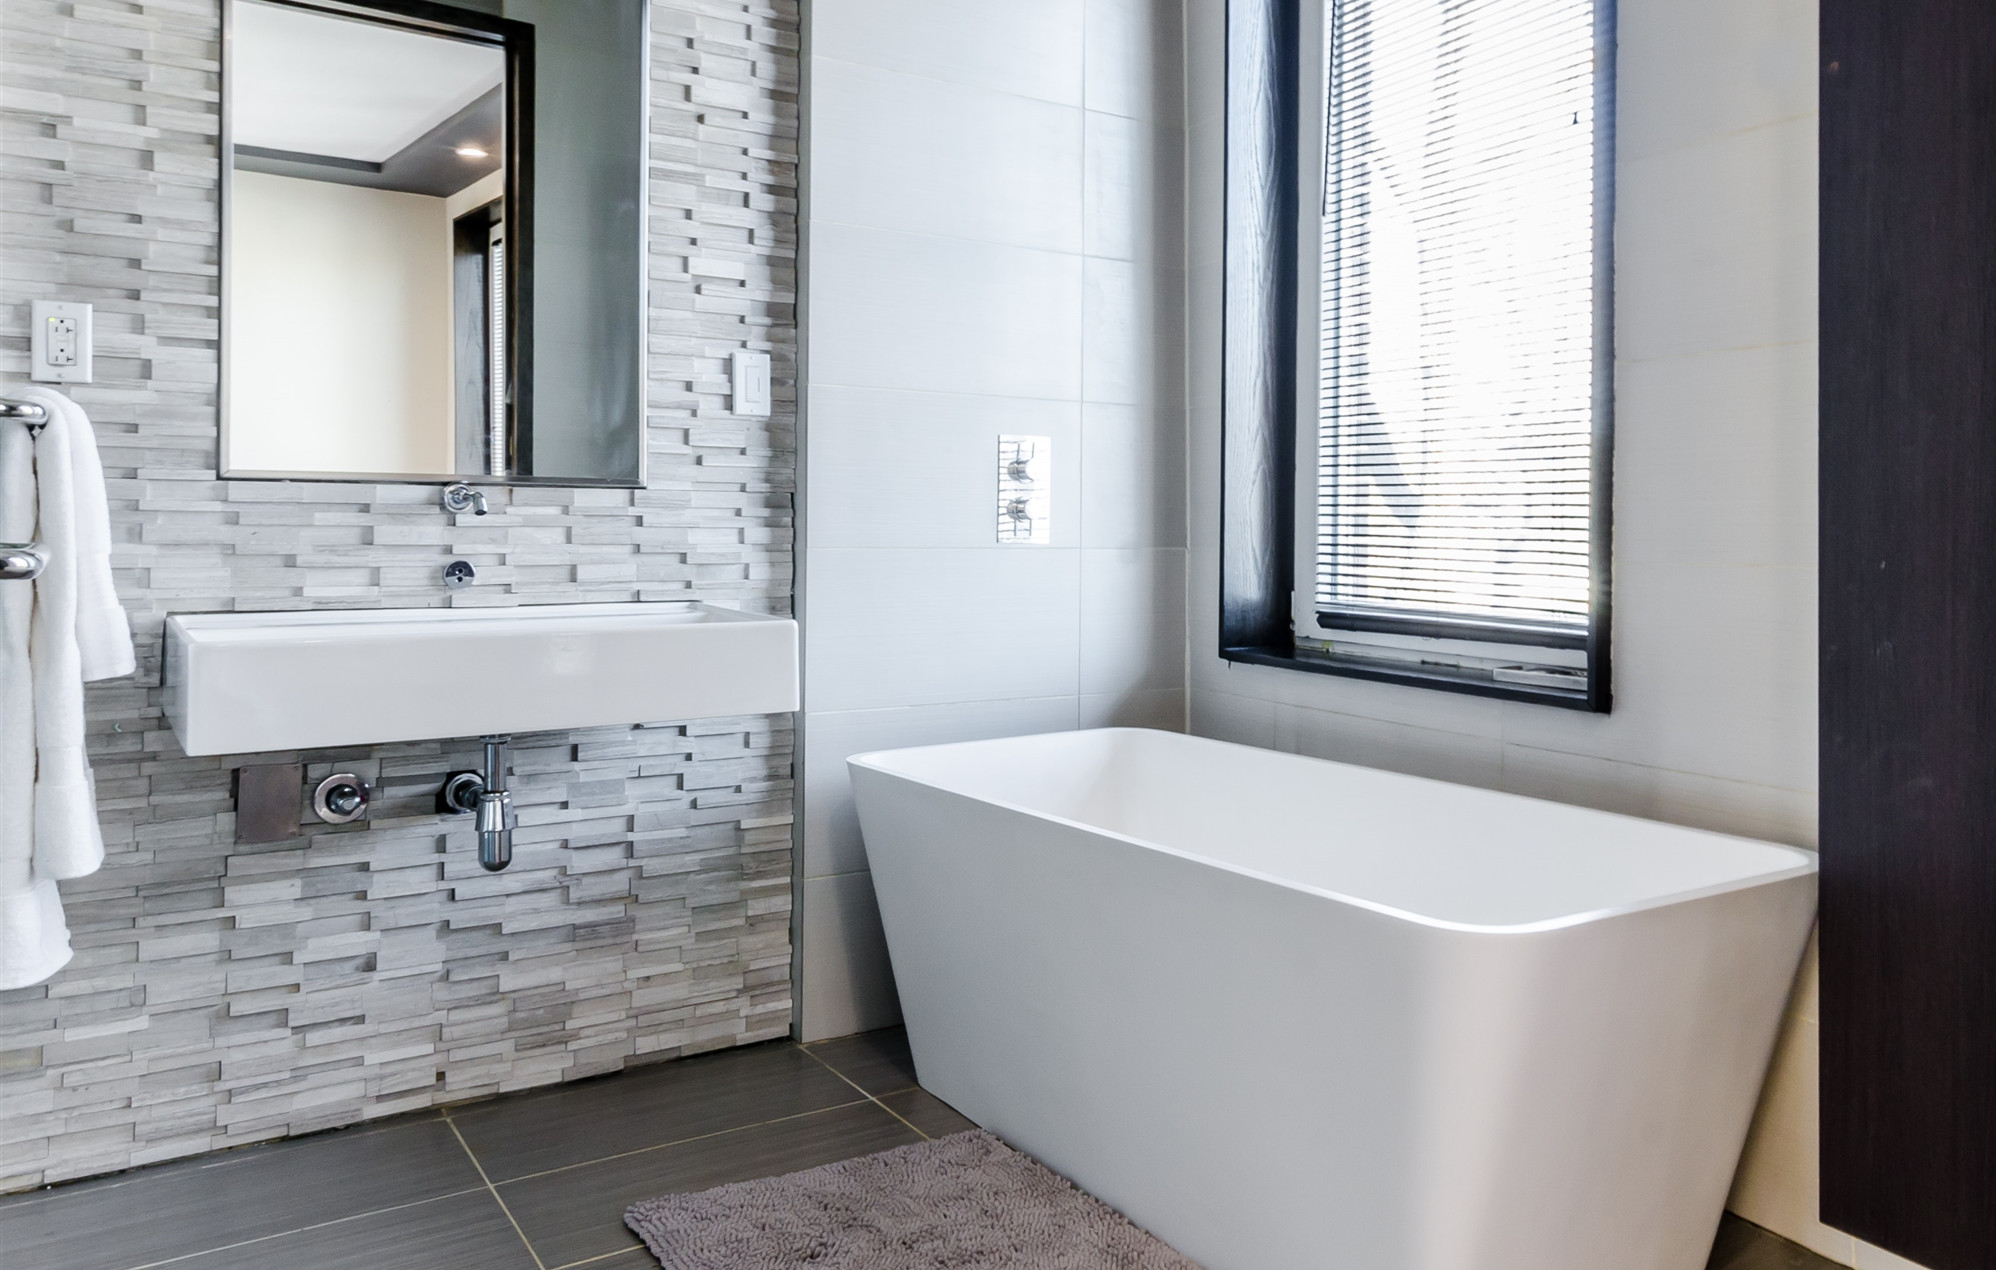 4 trends of bathroom decorating